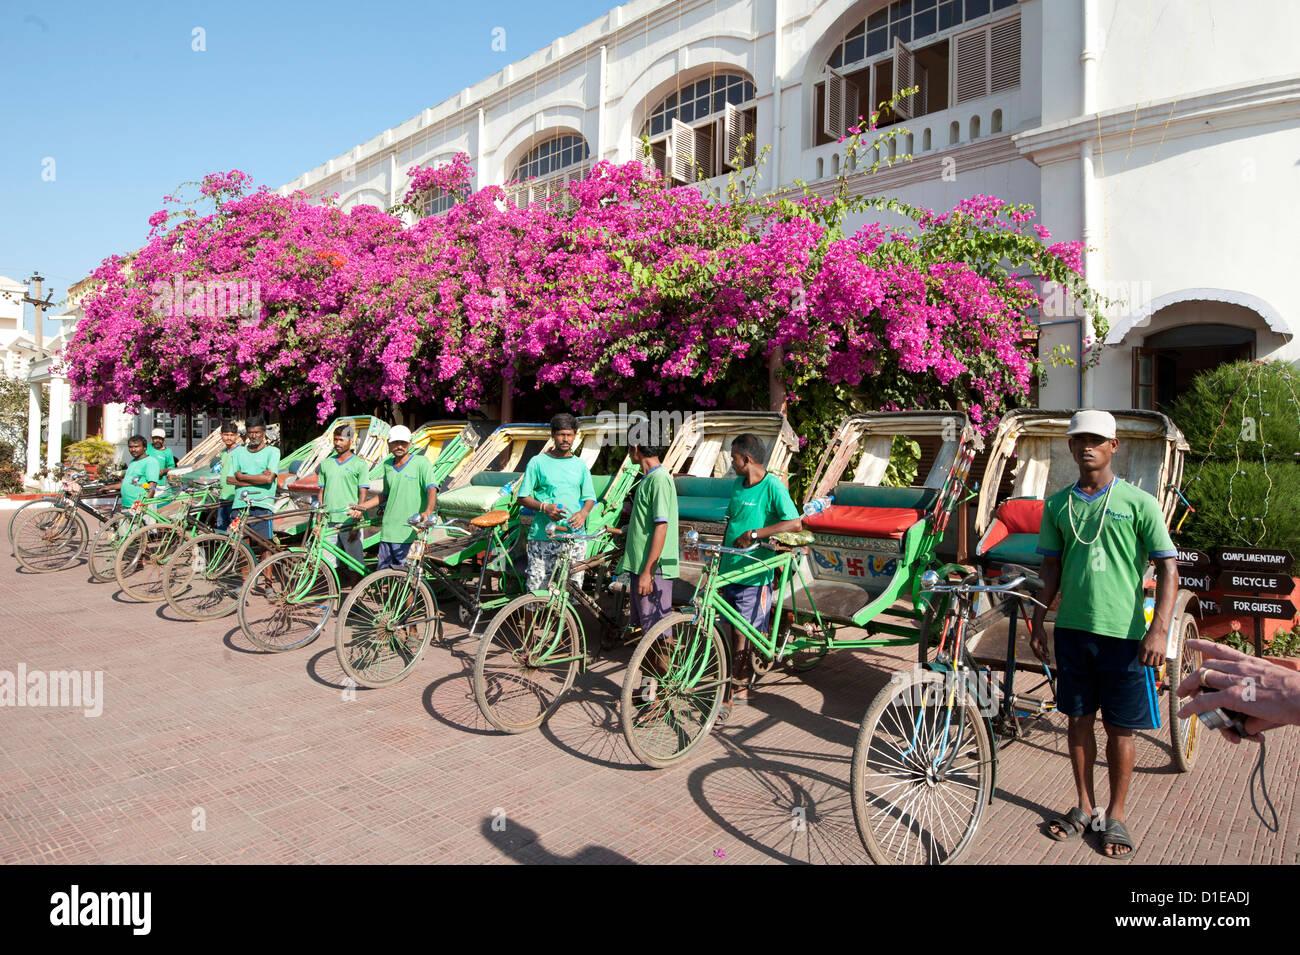 Green riders, cycle rickshaw wallahs encouraging environmentally friendly travel around Puri, Orissa, India - Stock Image